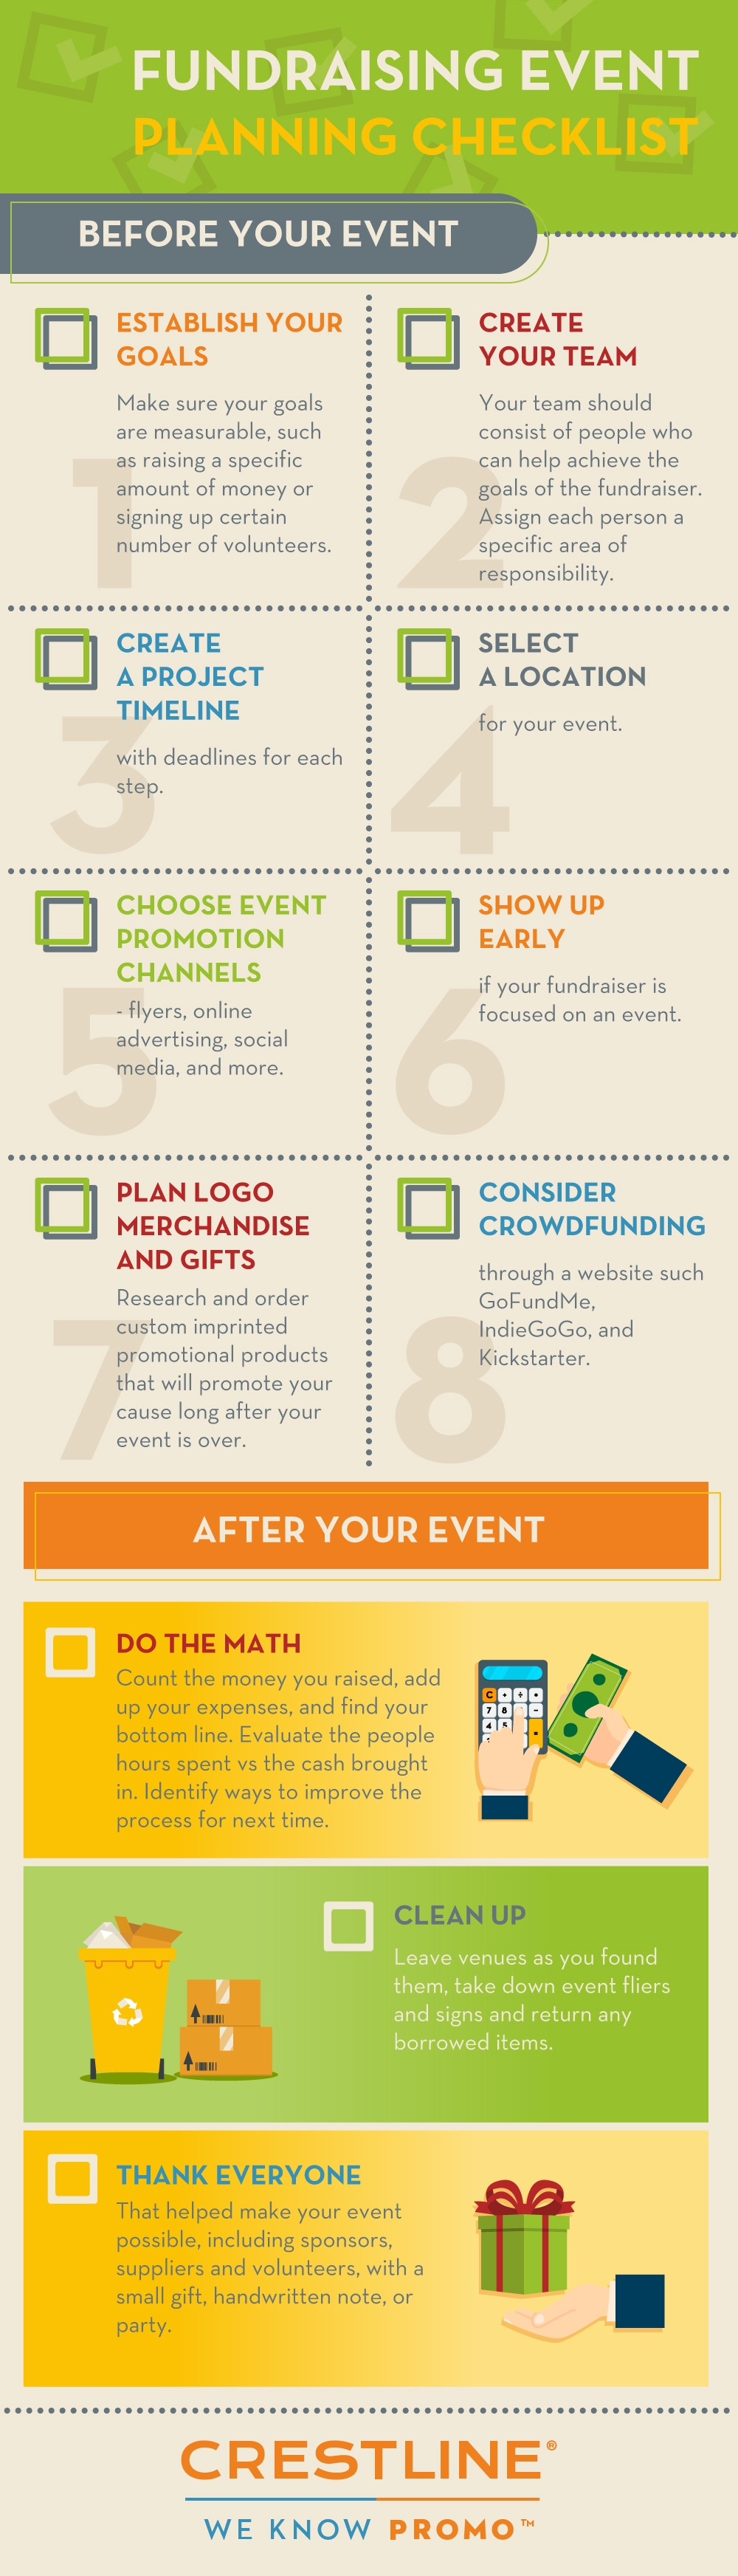 Fundraising Checklist Infographic